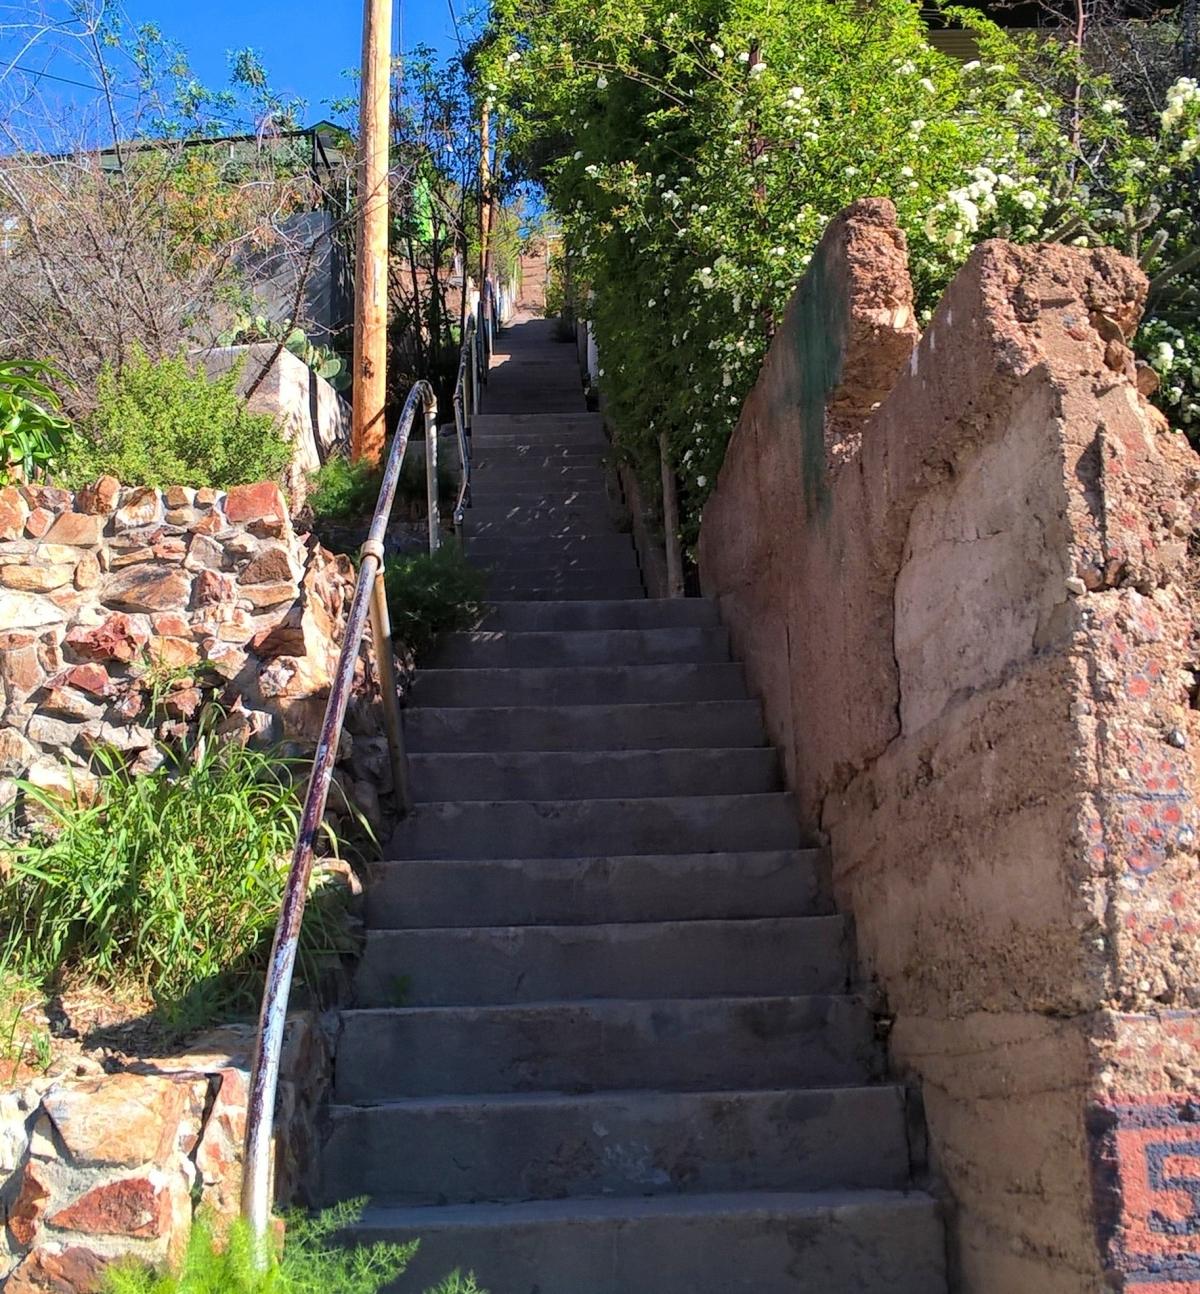 Bisbee 1000 StairClimb